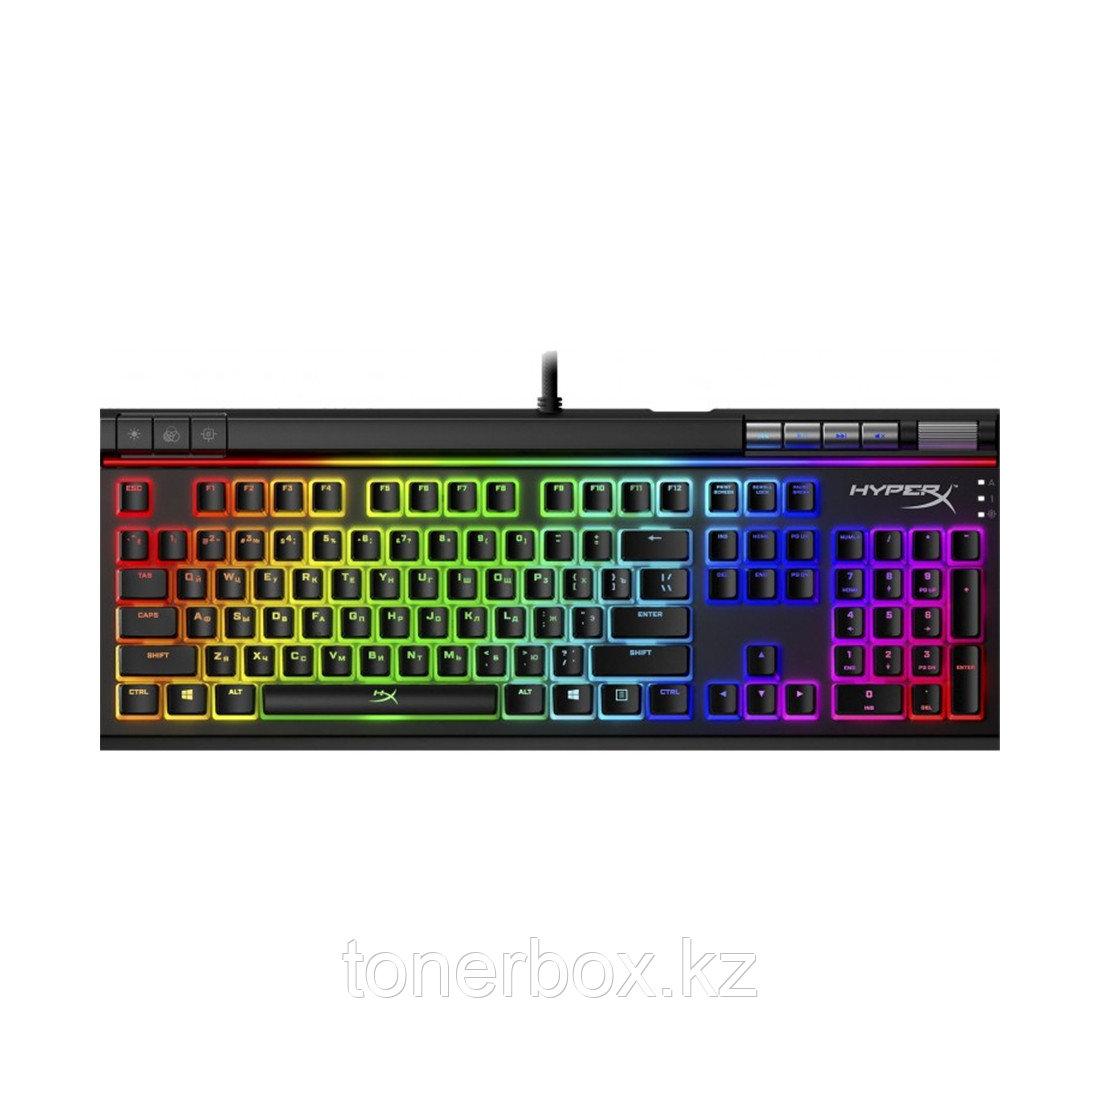 Клавиатура HyperX Alloy Elite II HKBE2X-1X-RU/G - фото 2